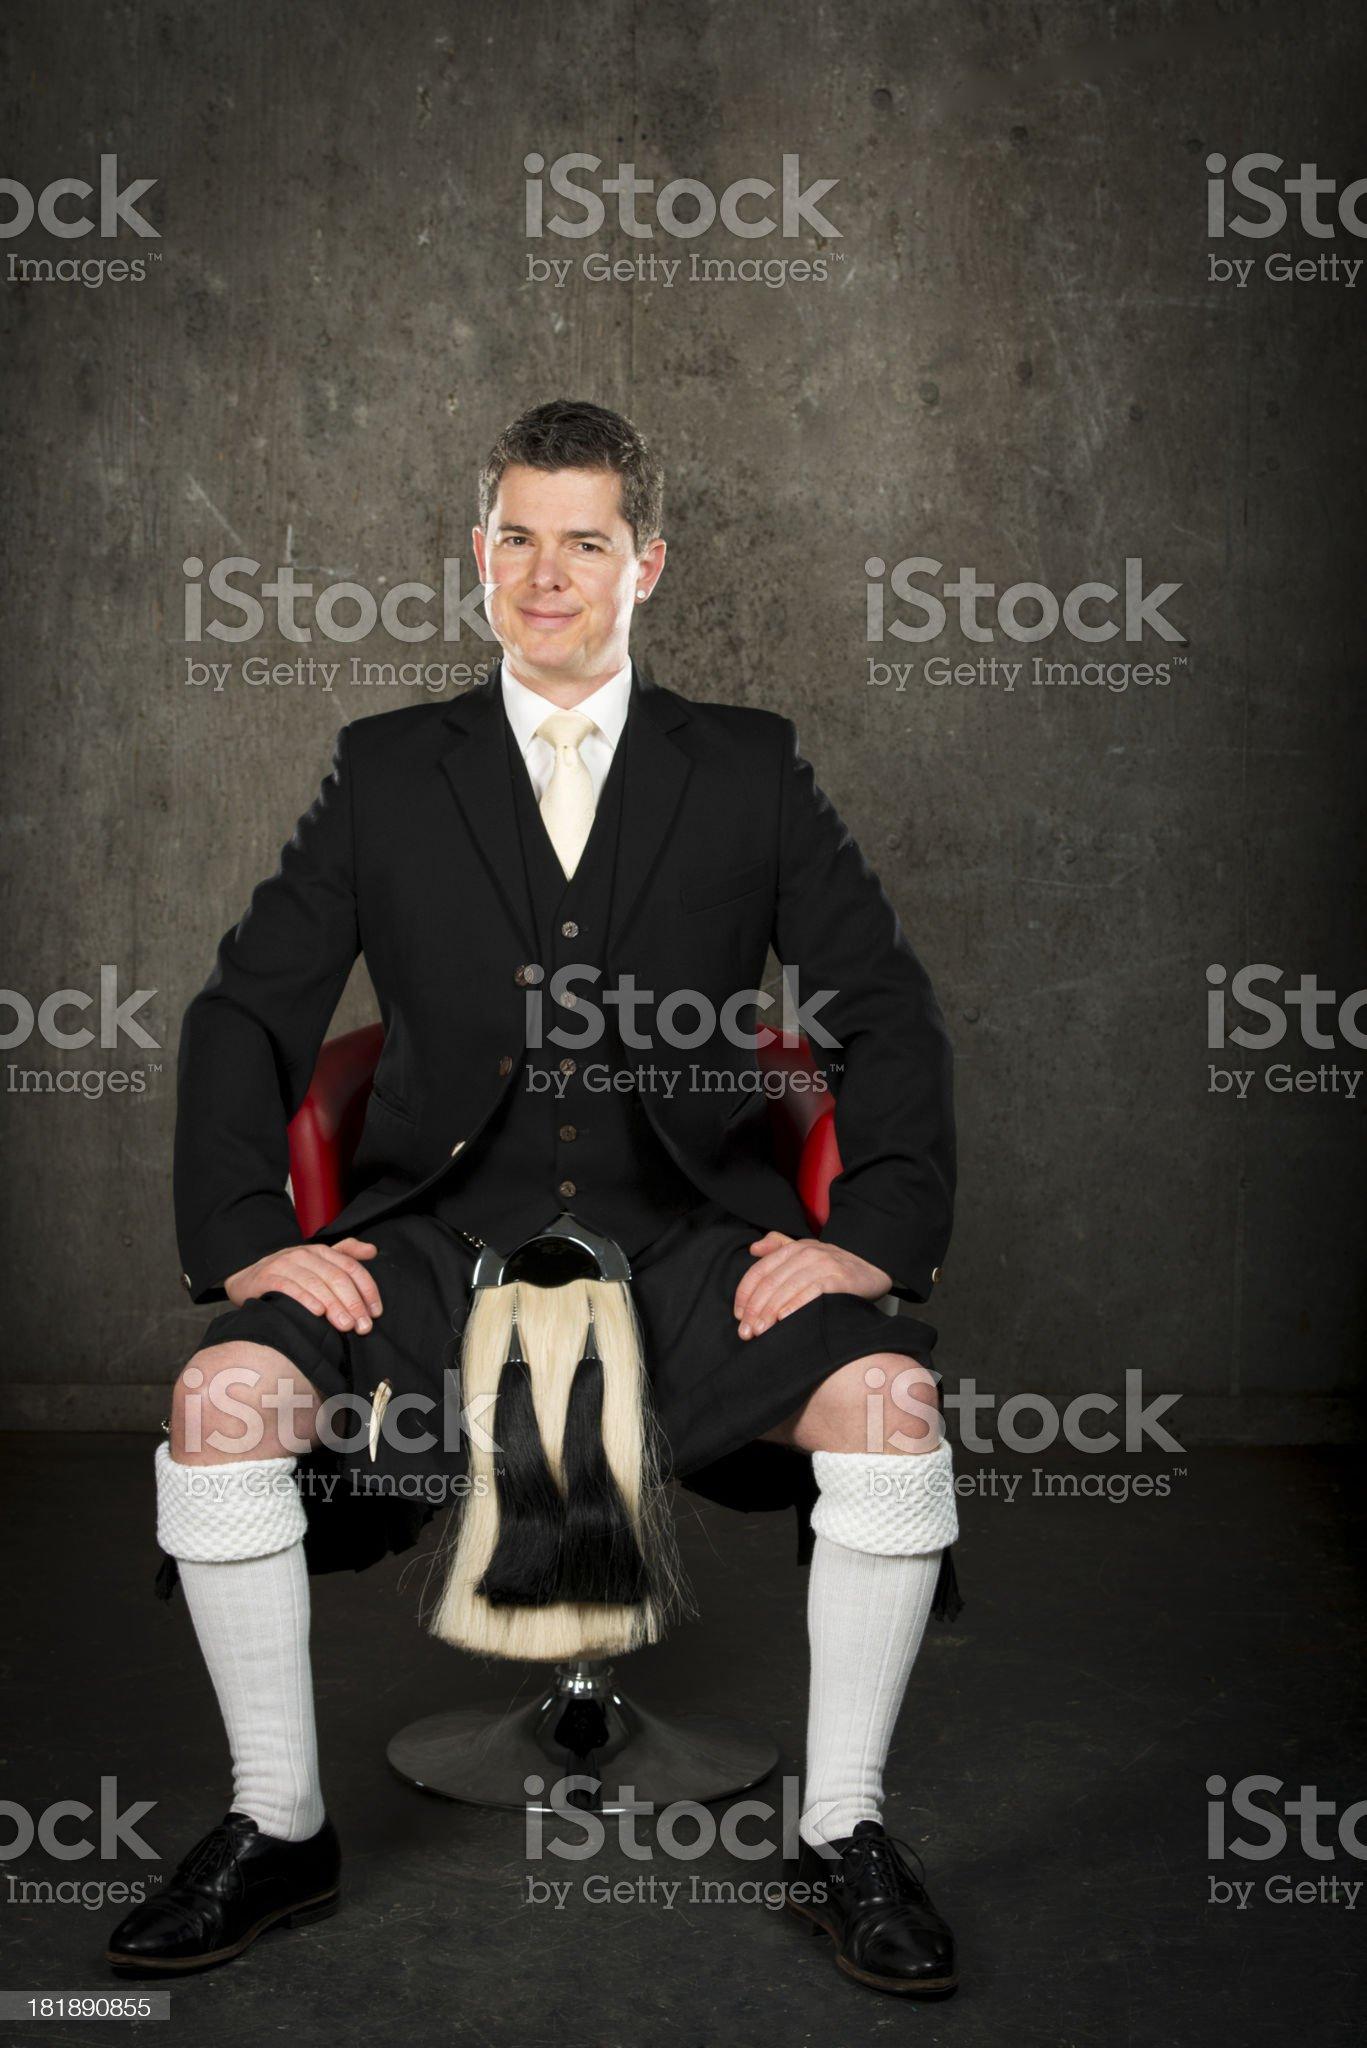 Man in a kilt royalty-free stock photo